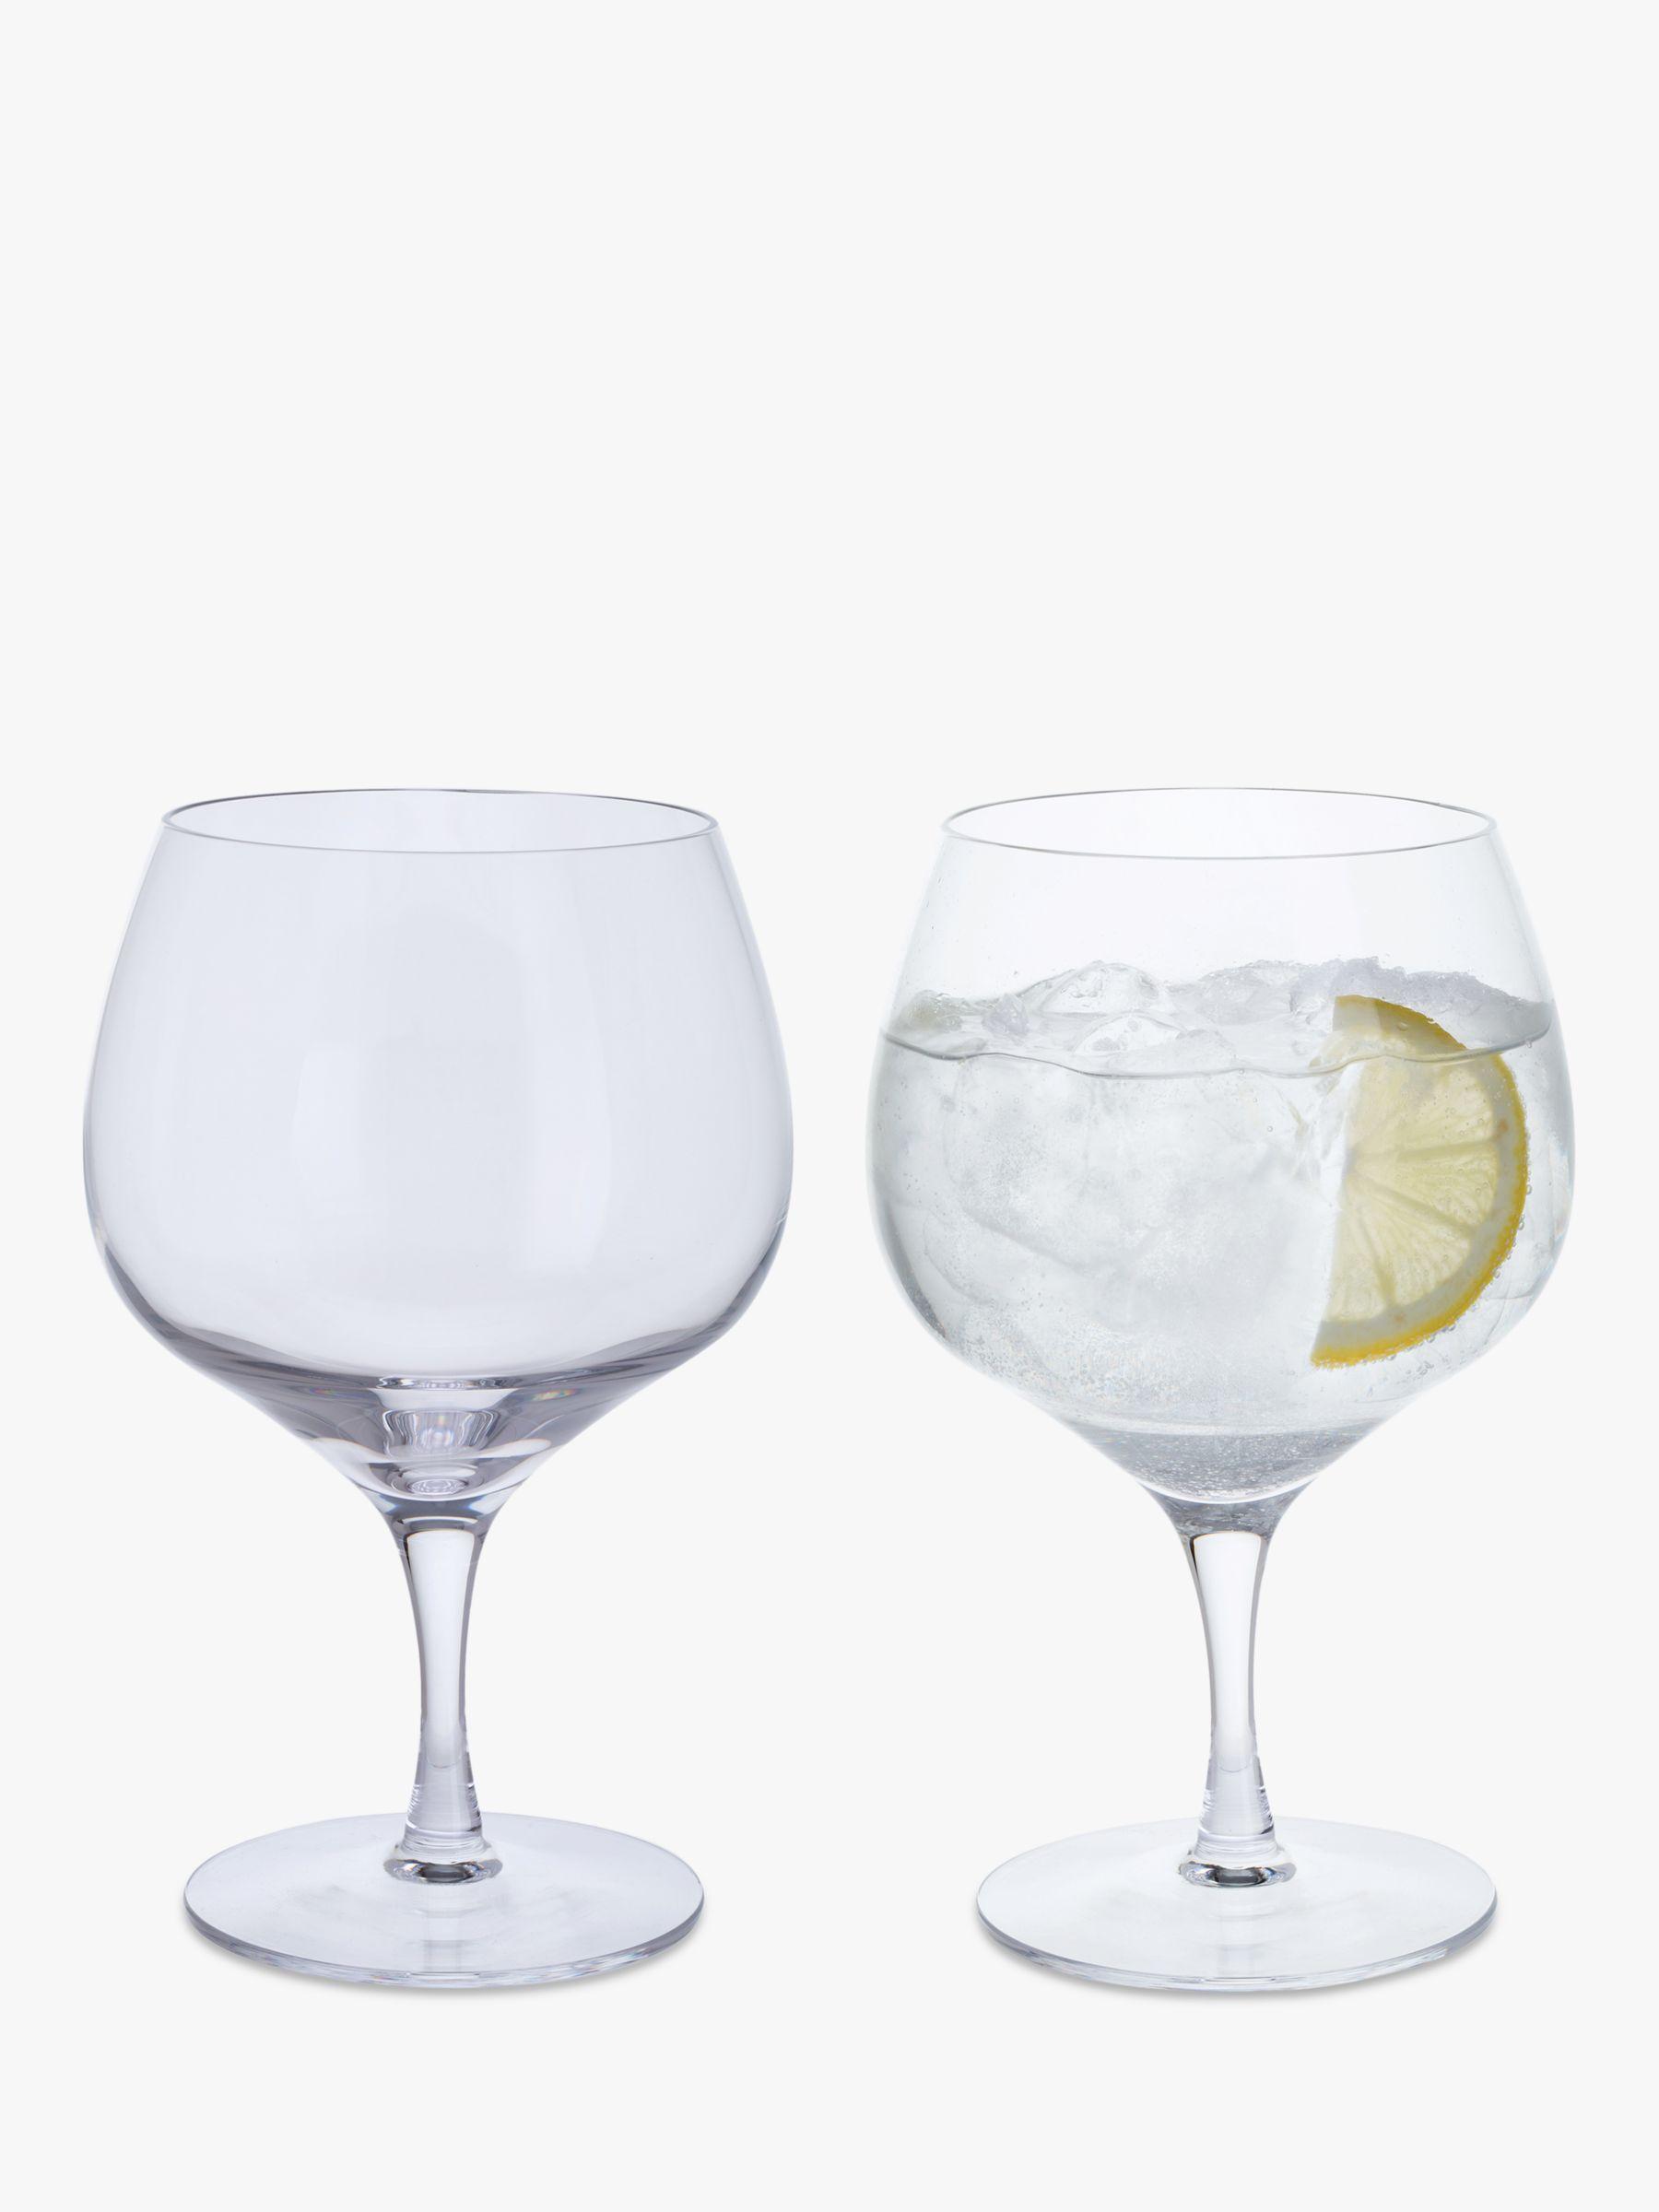 Dartington Crystal Dartington Crystal Gin Story Copa Glass, 630ml, Set of 2, Clear